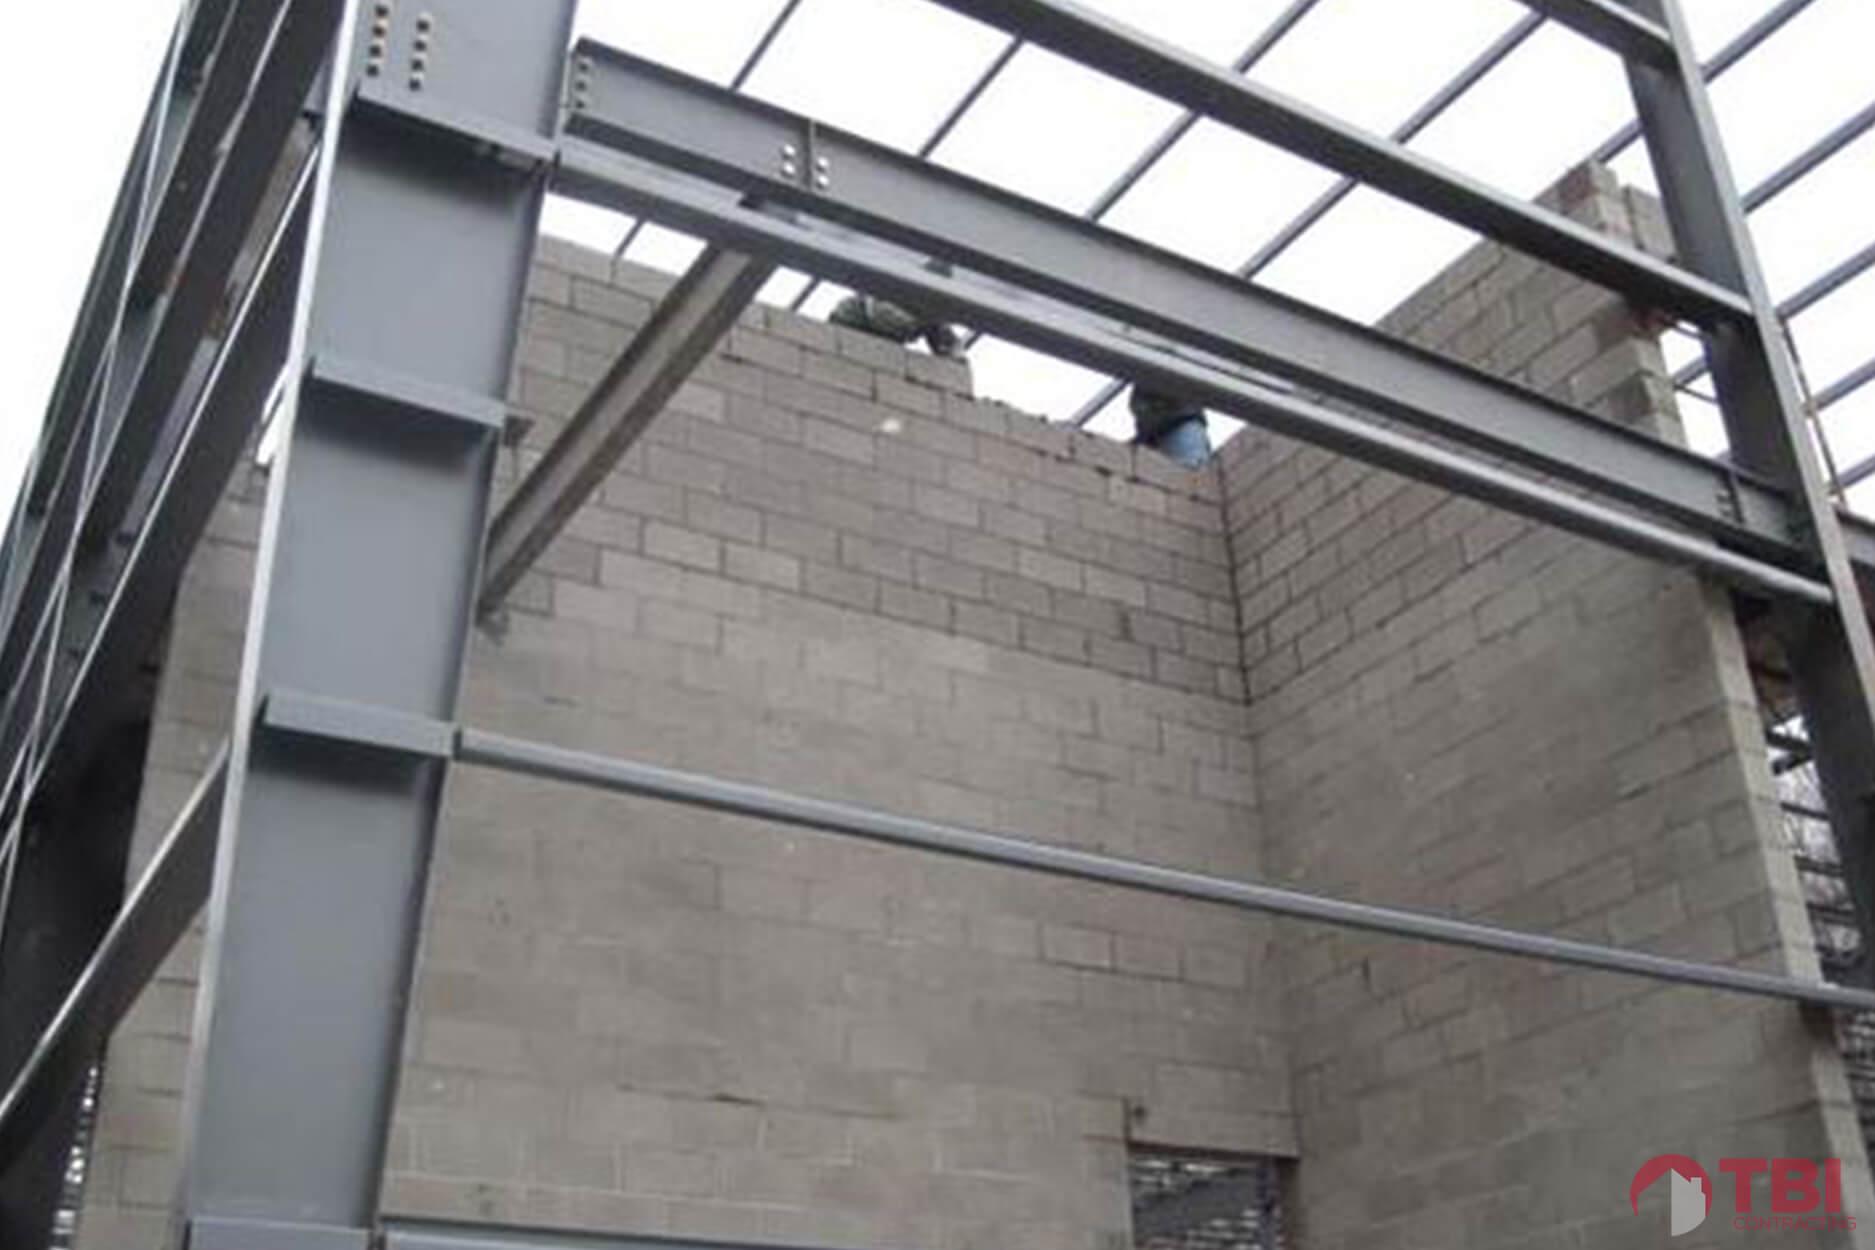 https://tbicontracting.com/wp-content/uploads/2015/04/vincent-james-warehouse-project-5.jpg